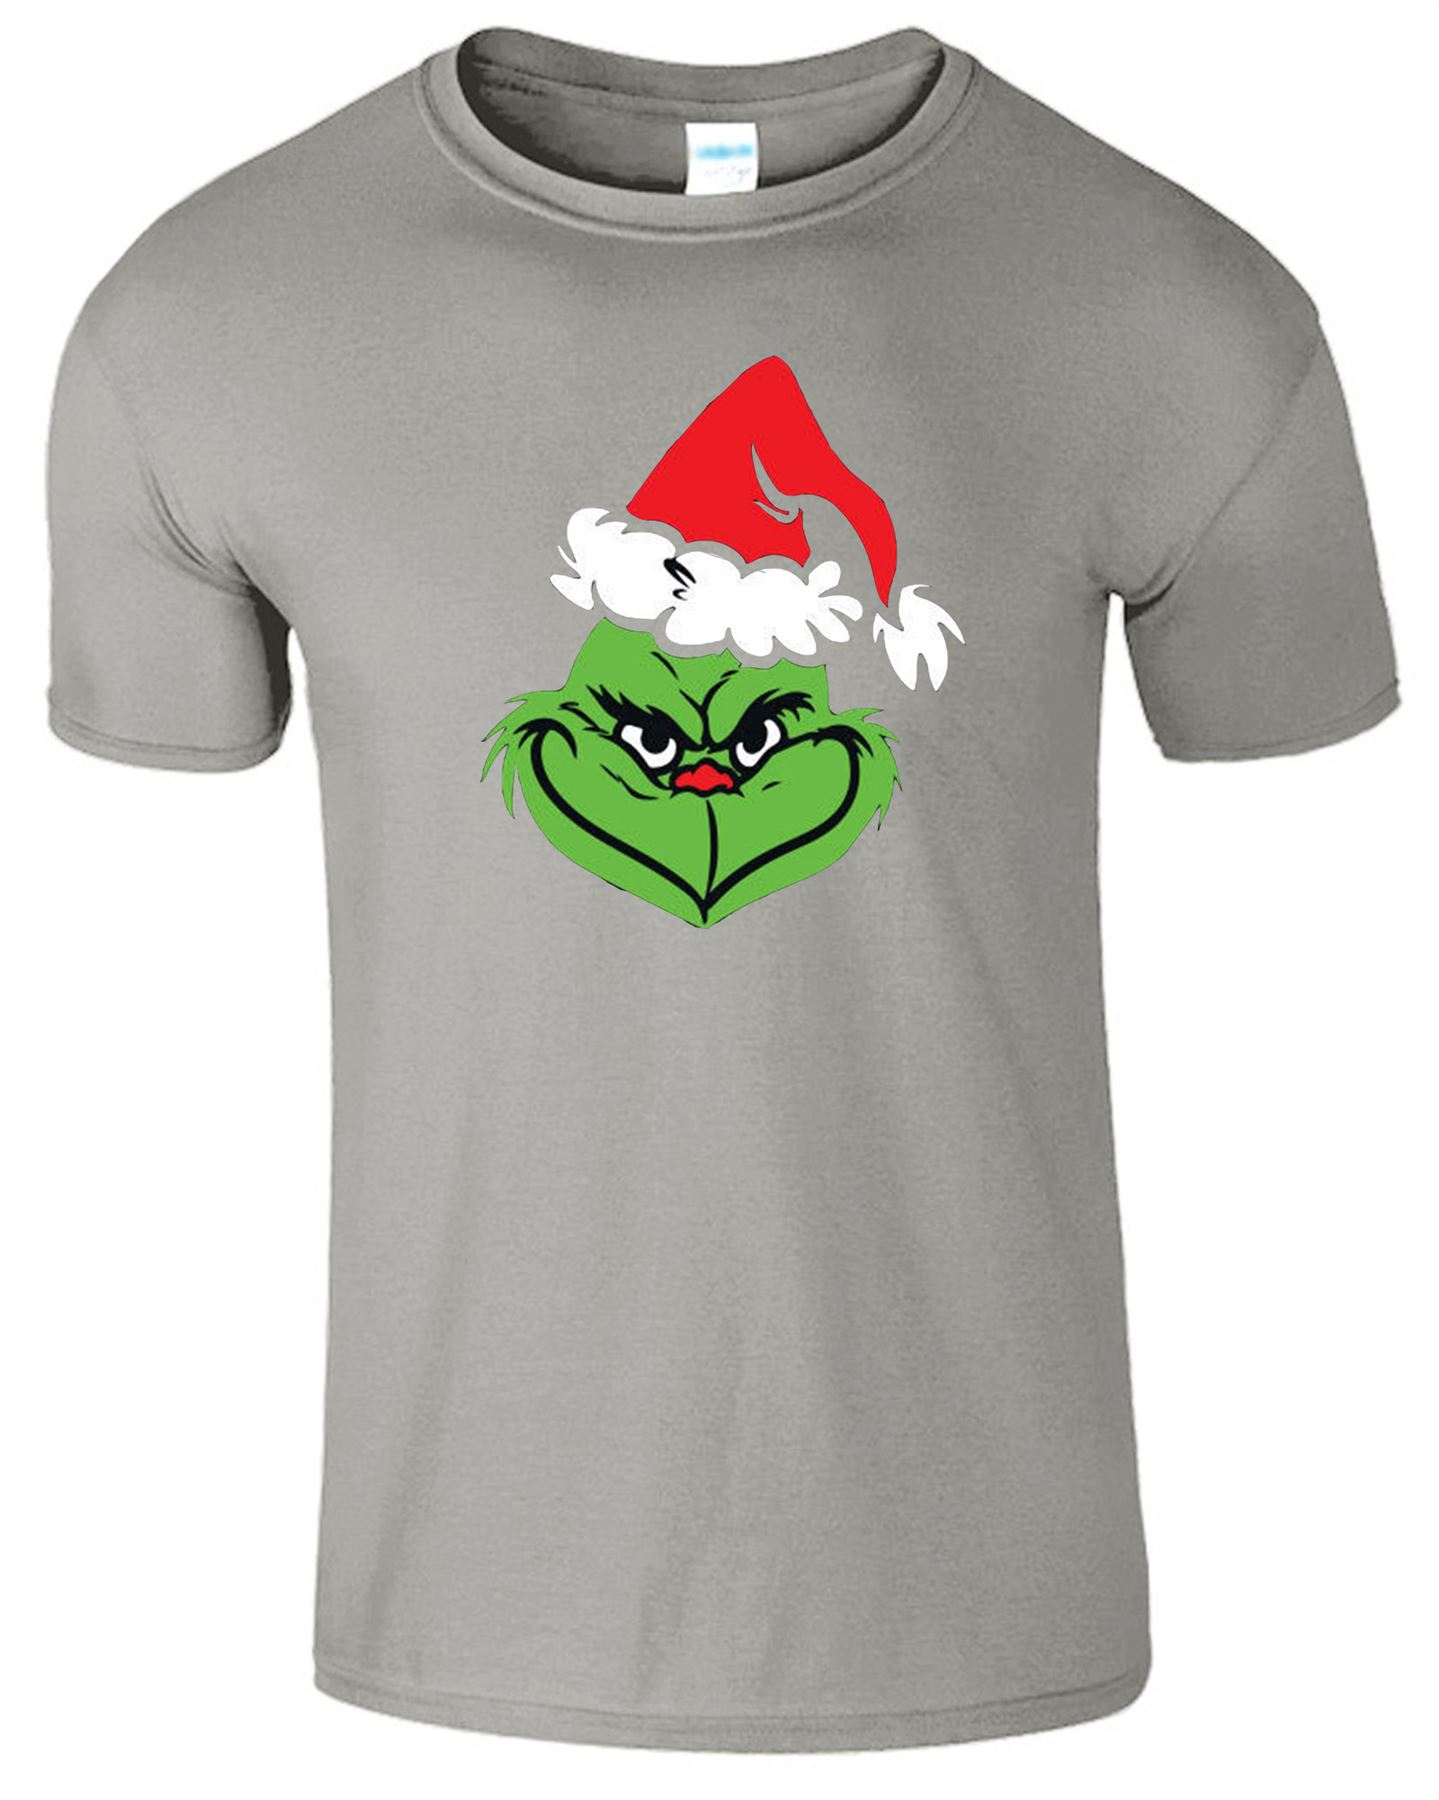 Humbug Green Kids T-shirt Christmas Novelty Festive Gift Present Funny T Shirt